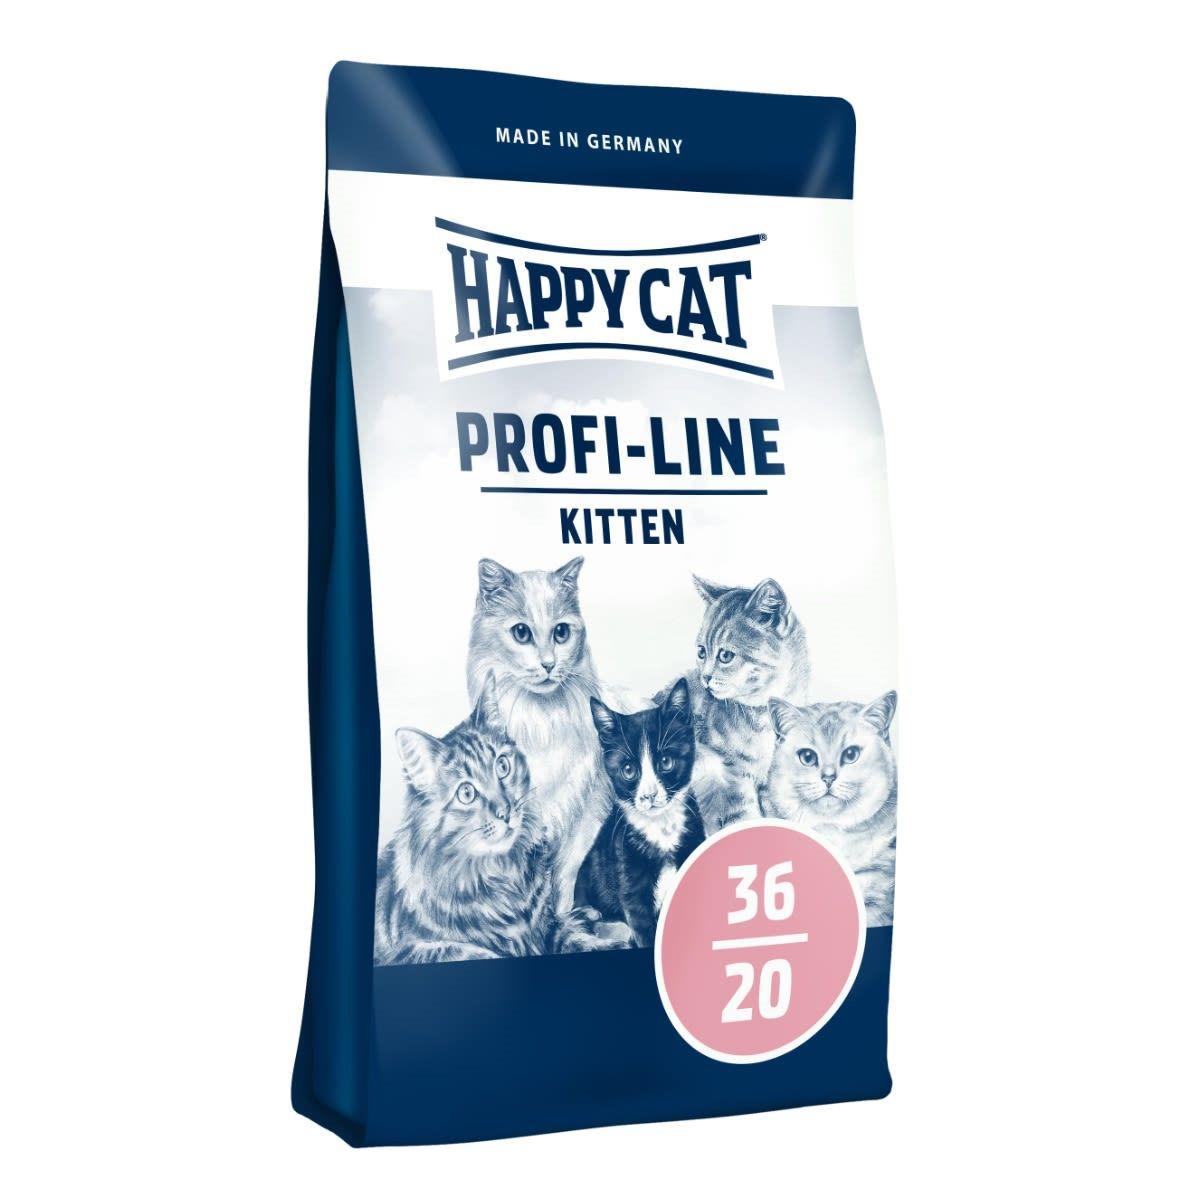 HAPPY CAT Profi Kitten 12 kg Happy Dog